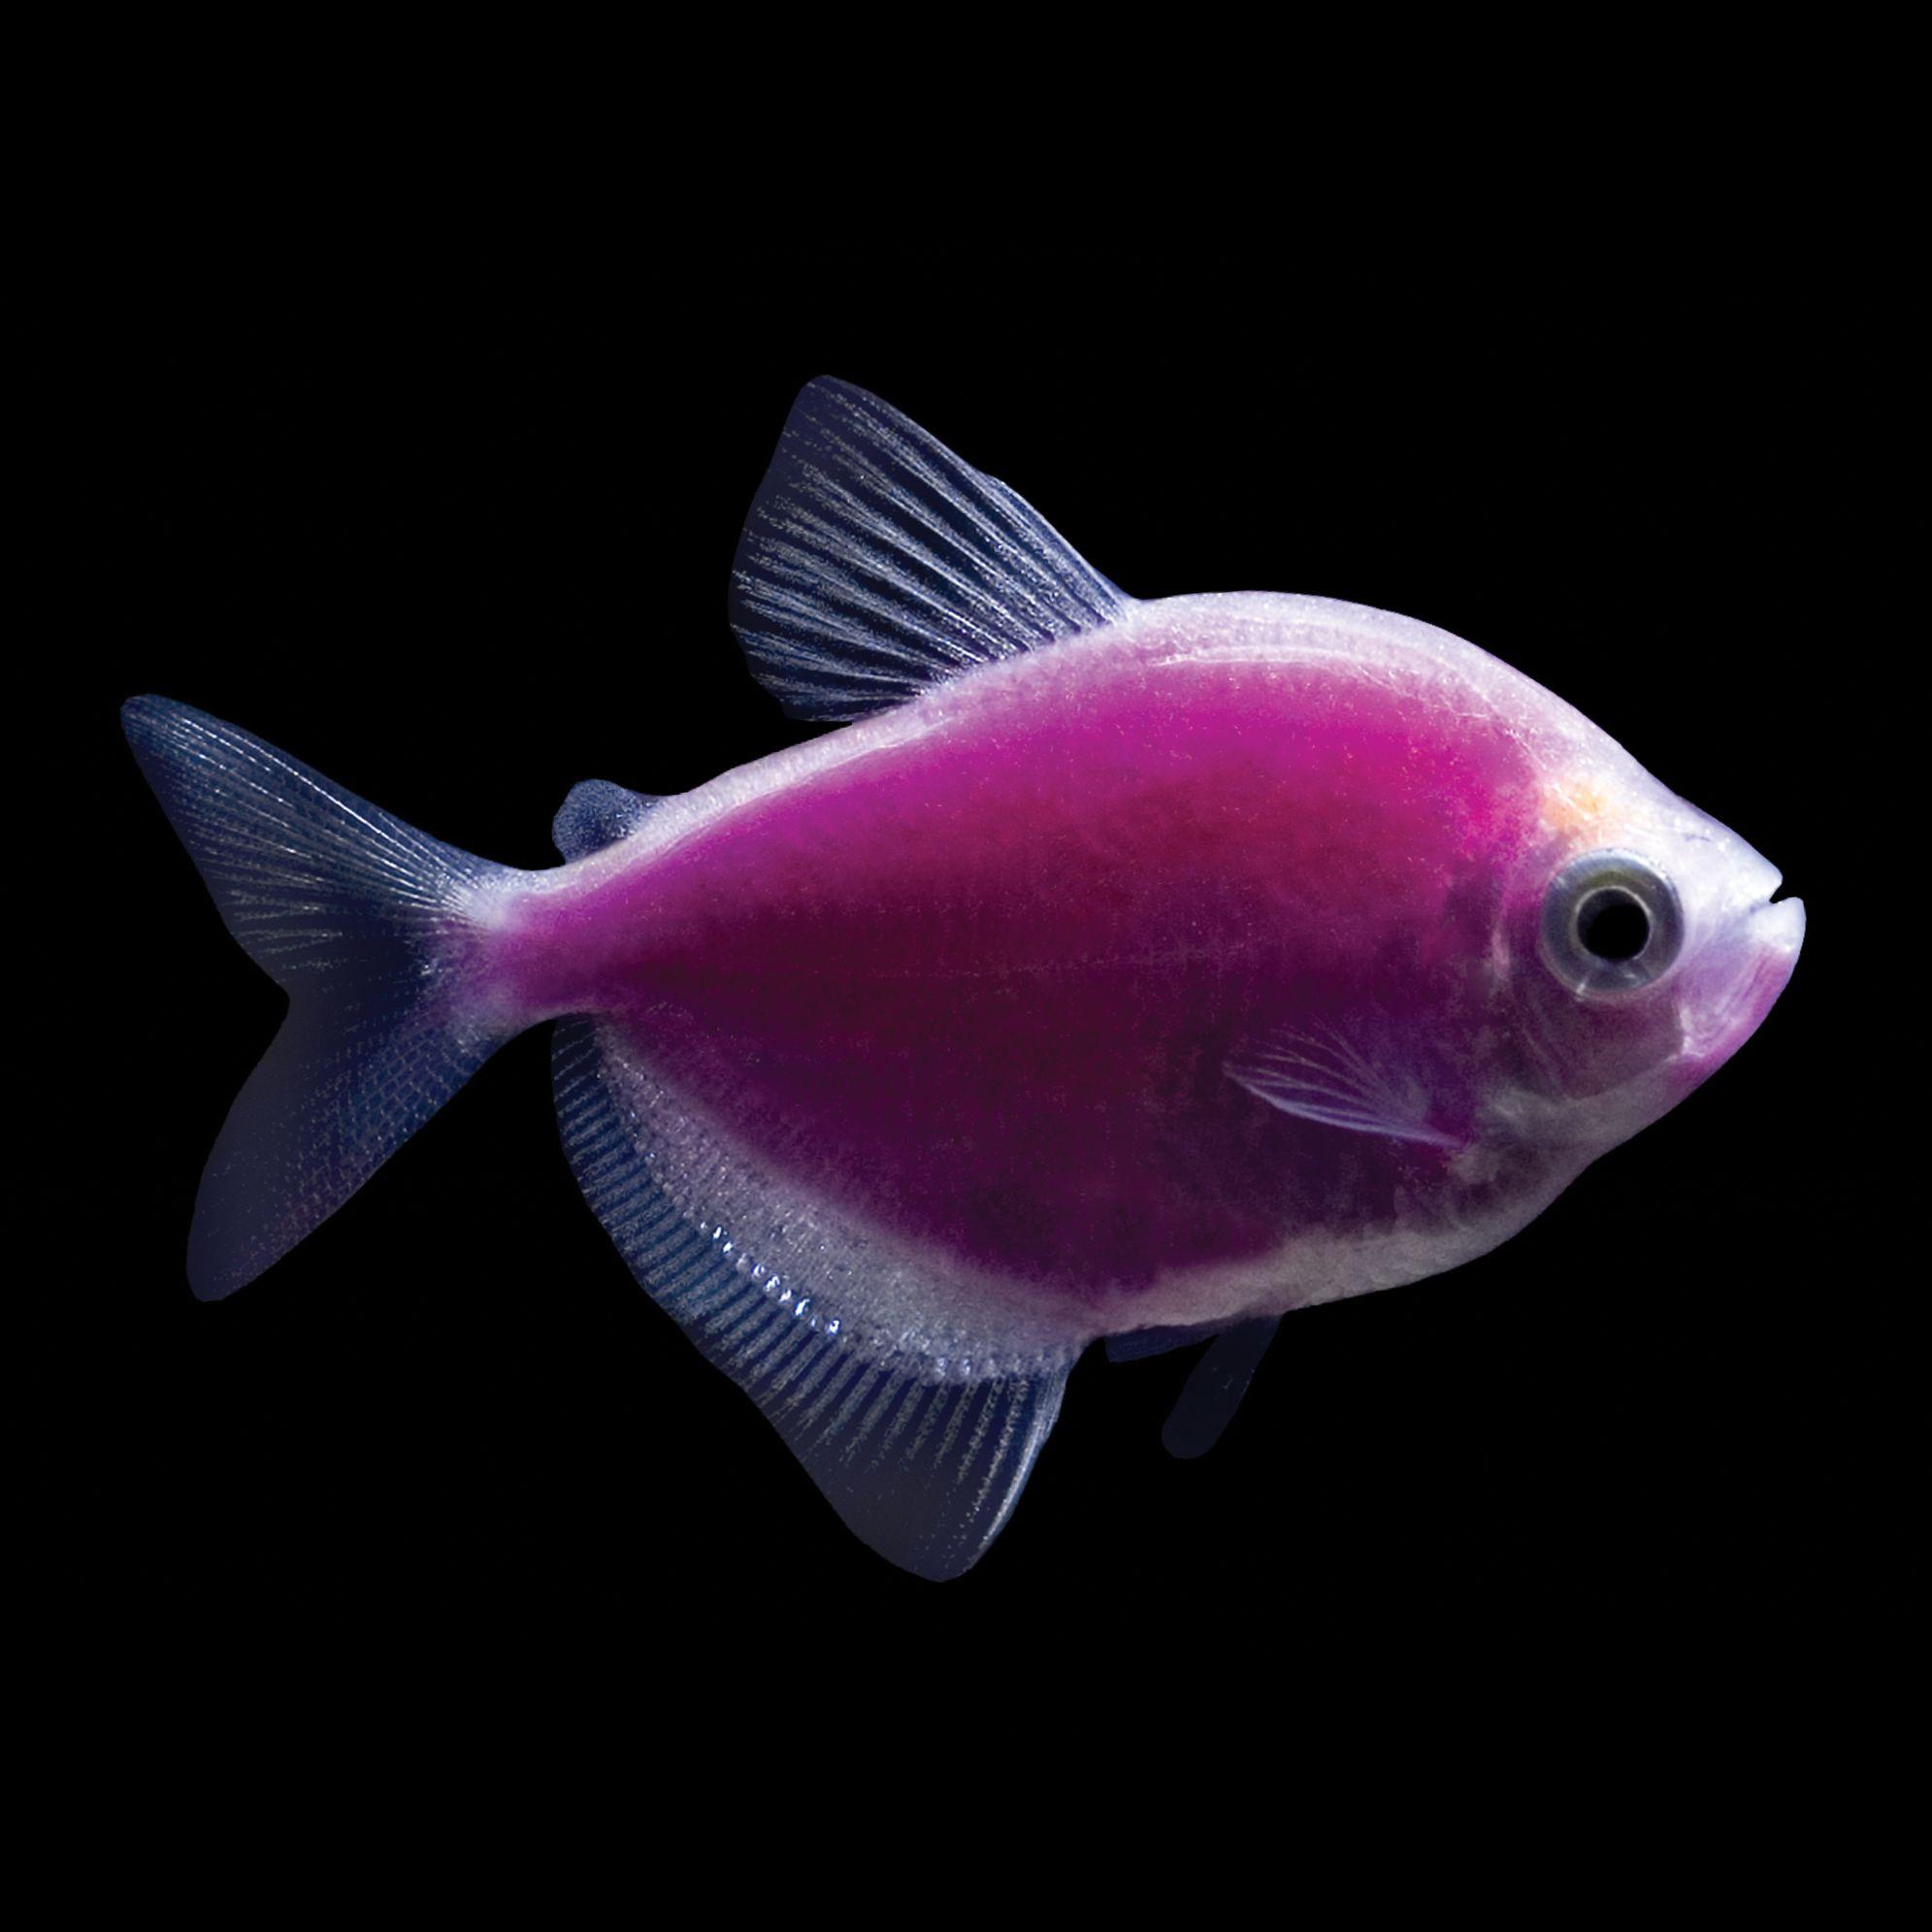 Freshwater fish for aquarium petsmart - Glofish Galactic Purple Tetras Are Beautiful Freshwater Tetra Fish That Glow Under Black Lights